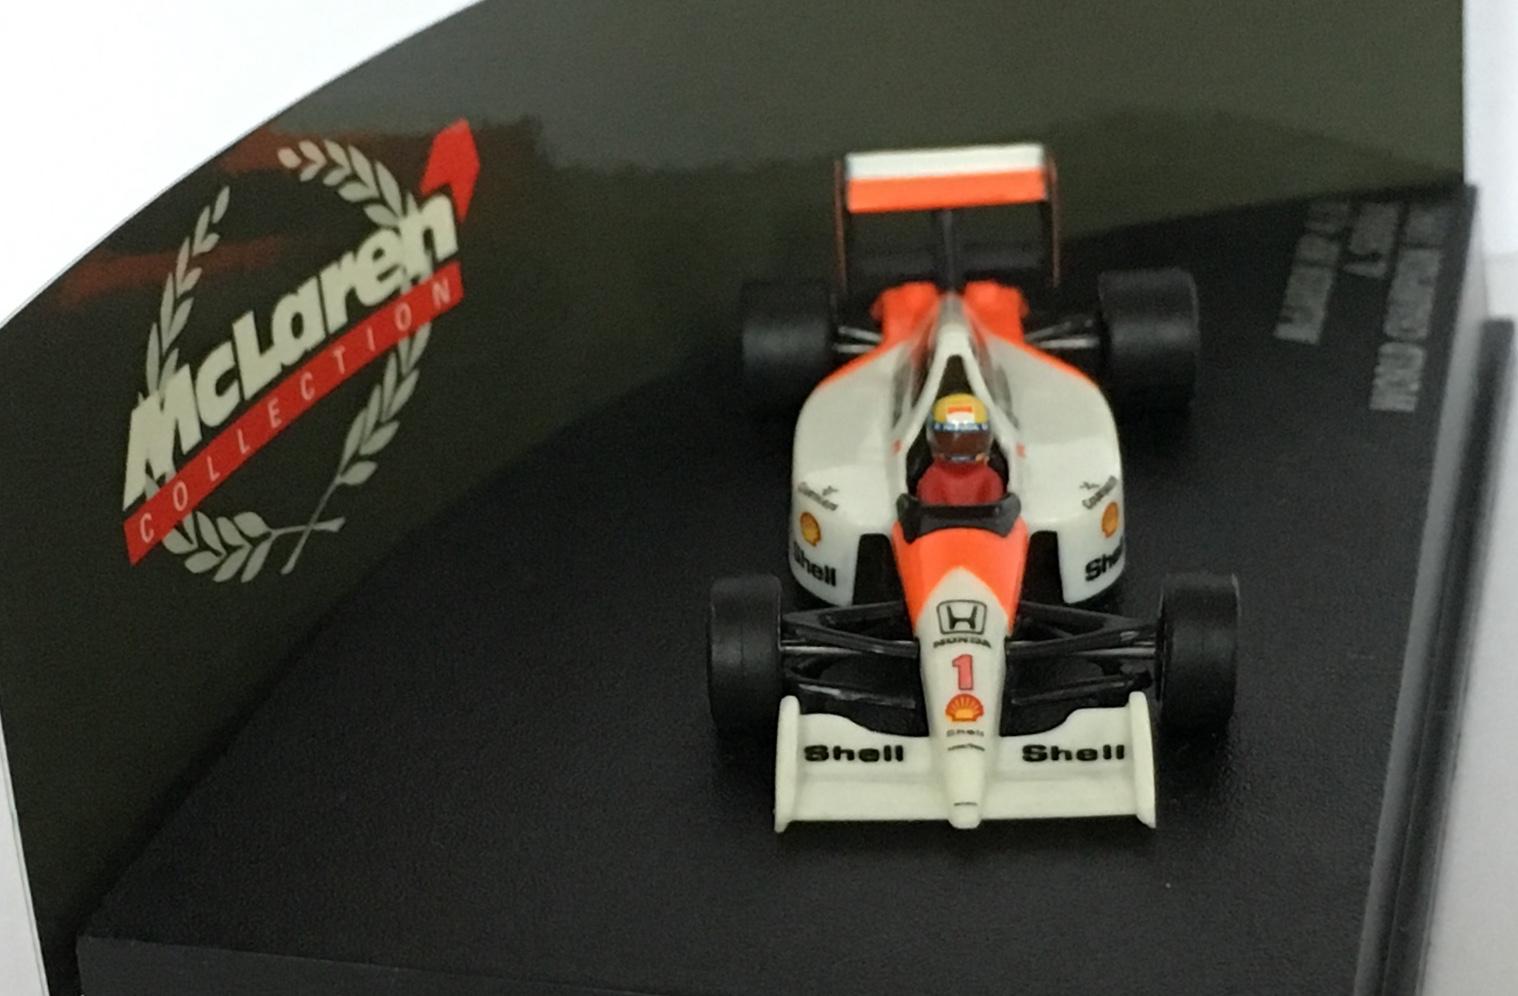 McLaren MP 4-6 Senna 004.jpg